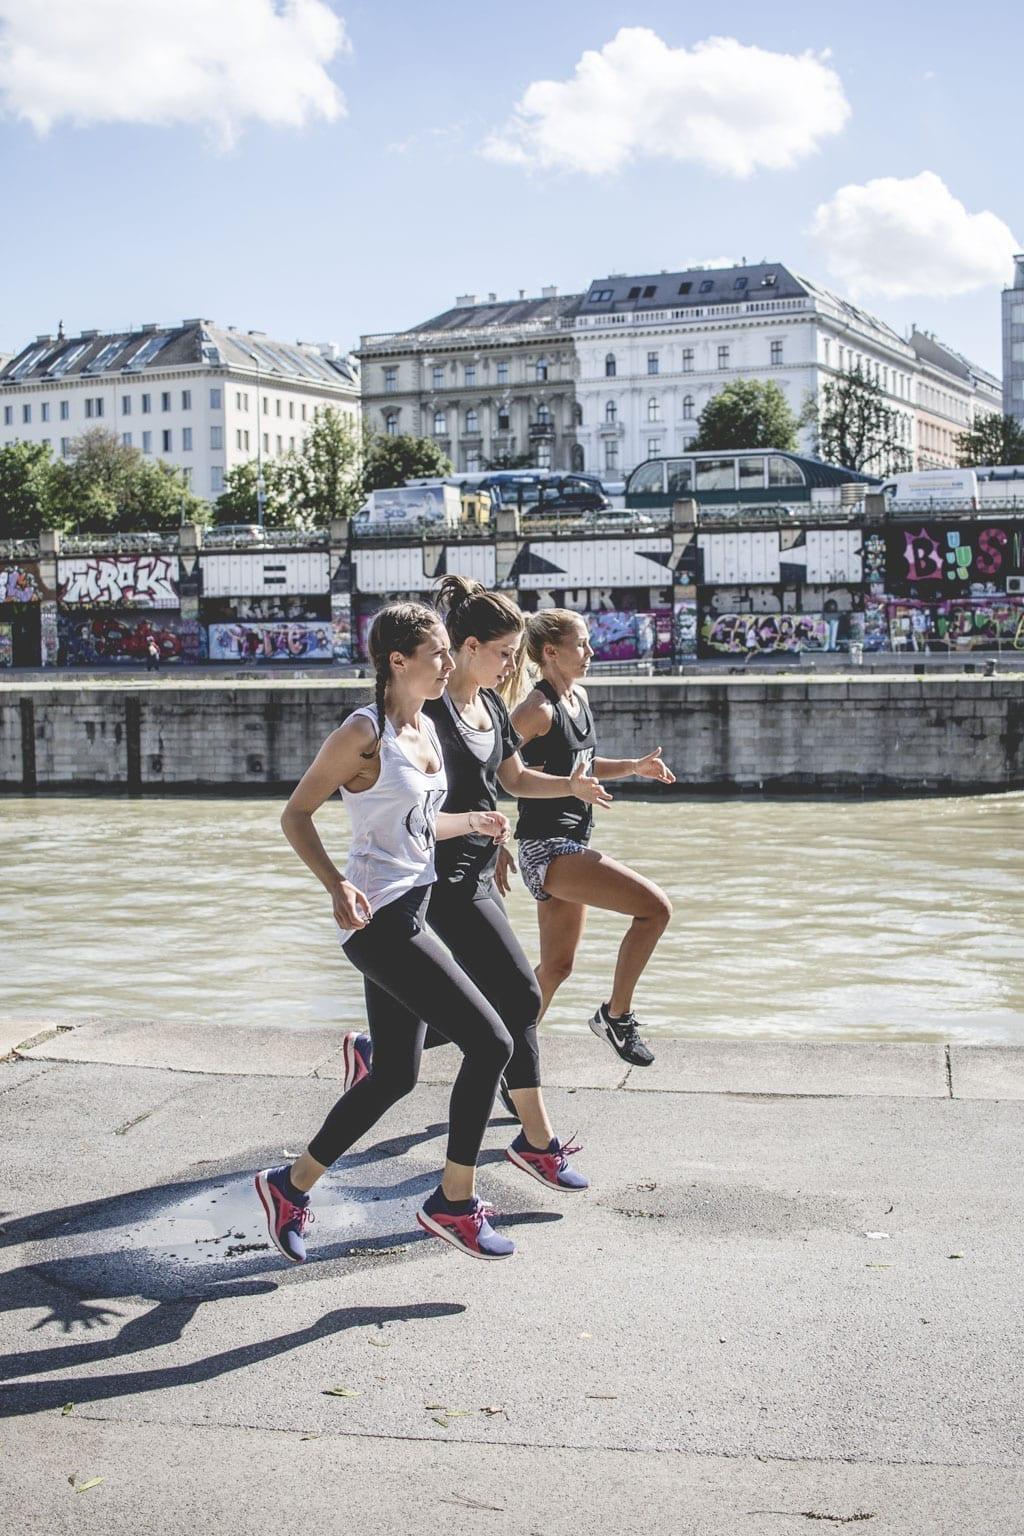 CK-1606-constantly-k-karin-kaswurm-daily-dose-fashion-lifestyle-blog-vicky-heiler-kathi-schmalzl-workout-4